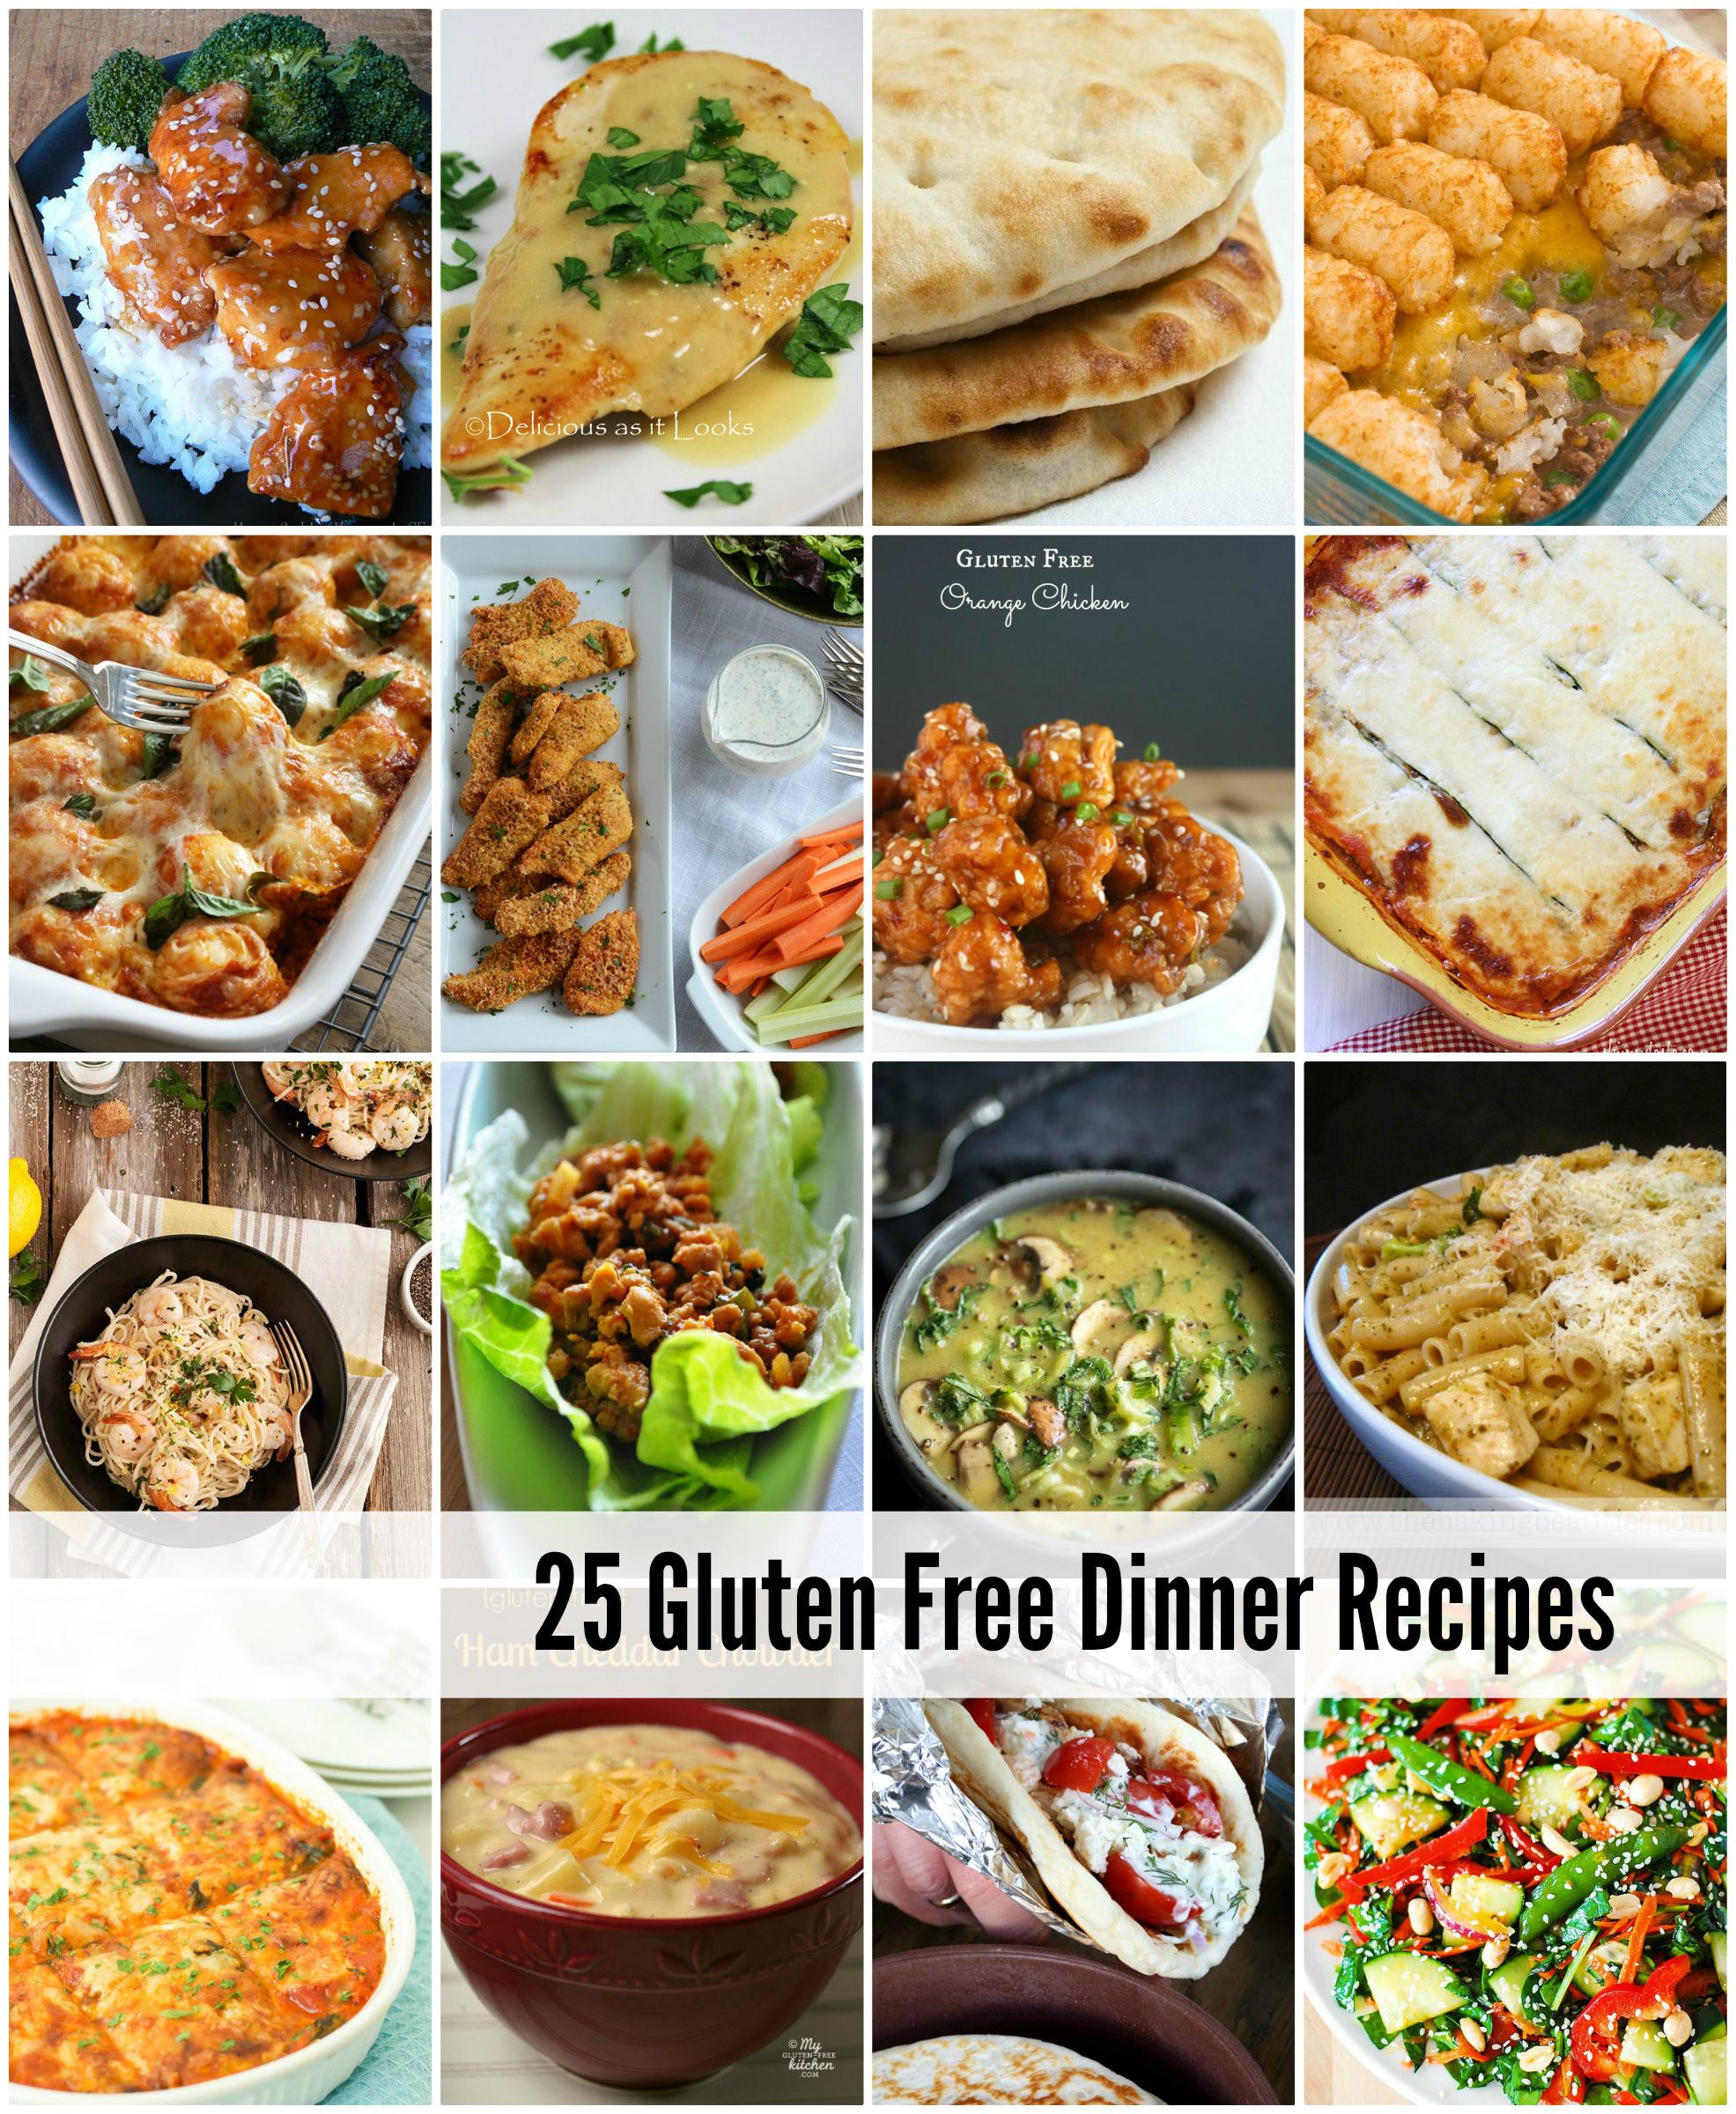 Gluten Free Foods Recipes  easy gluten free dinner recipes for family